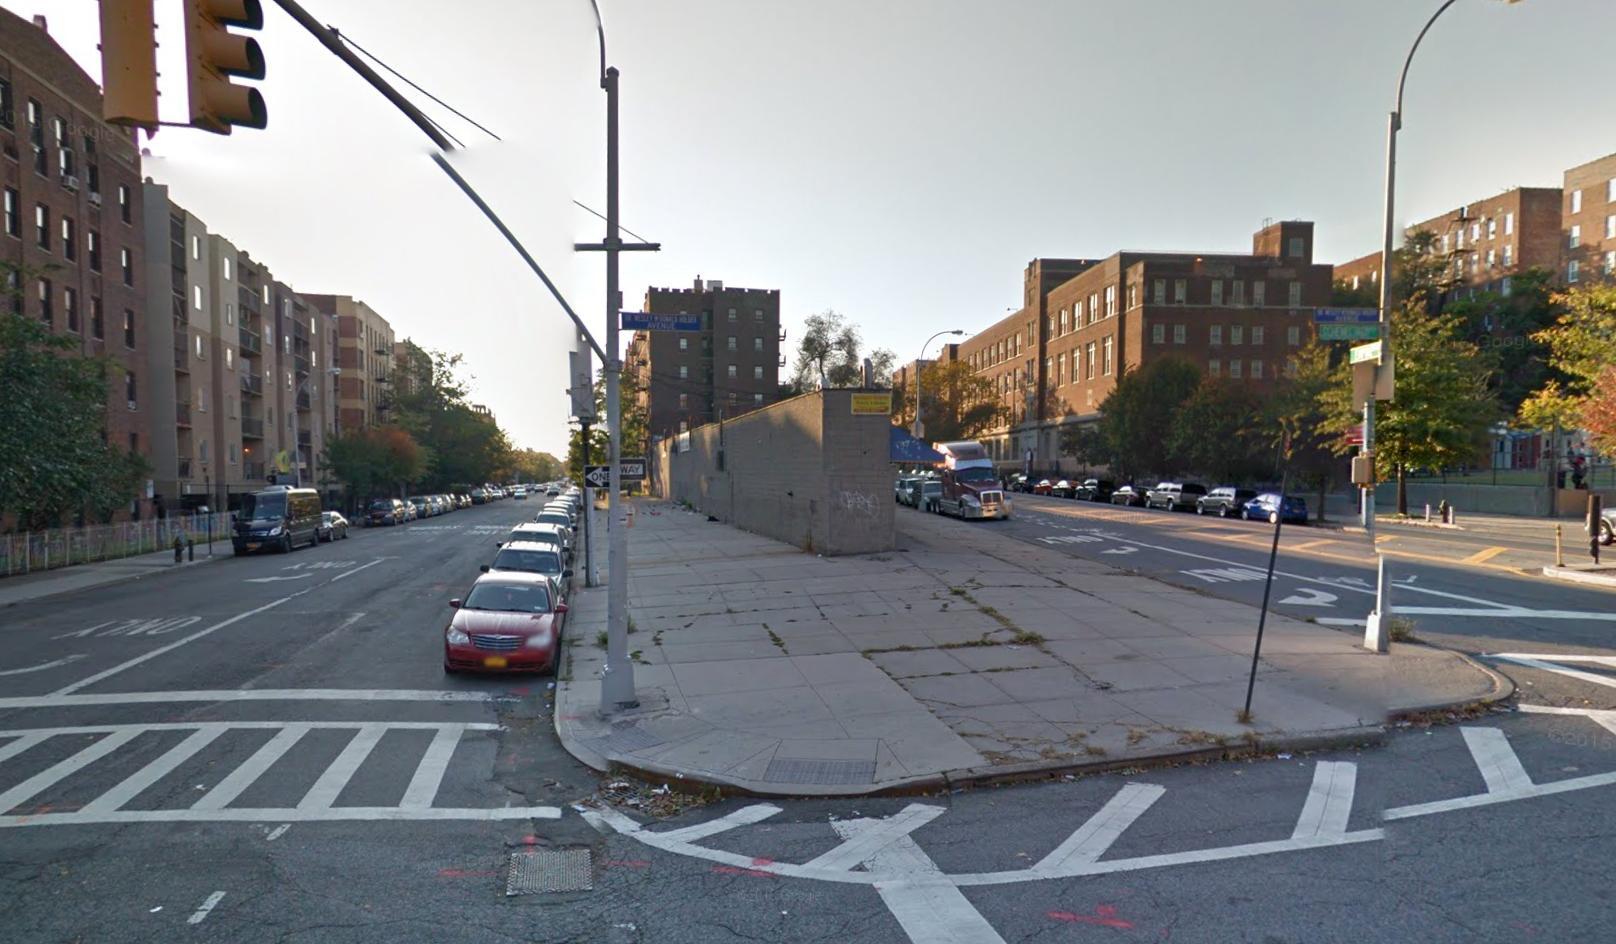 800 Empire Boulevard